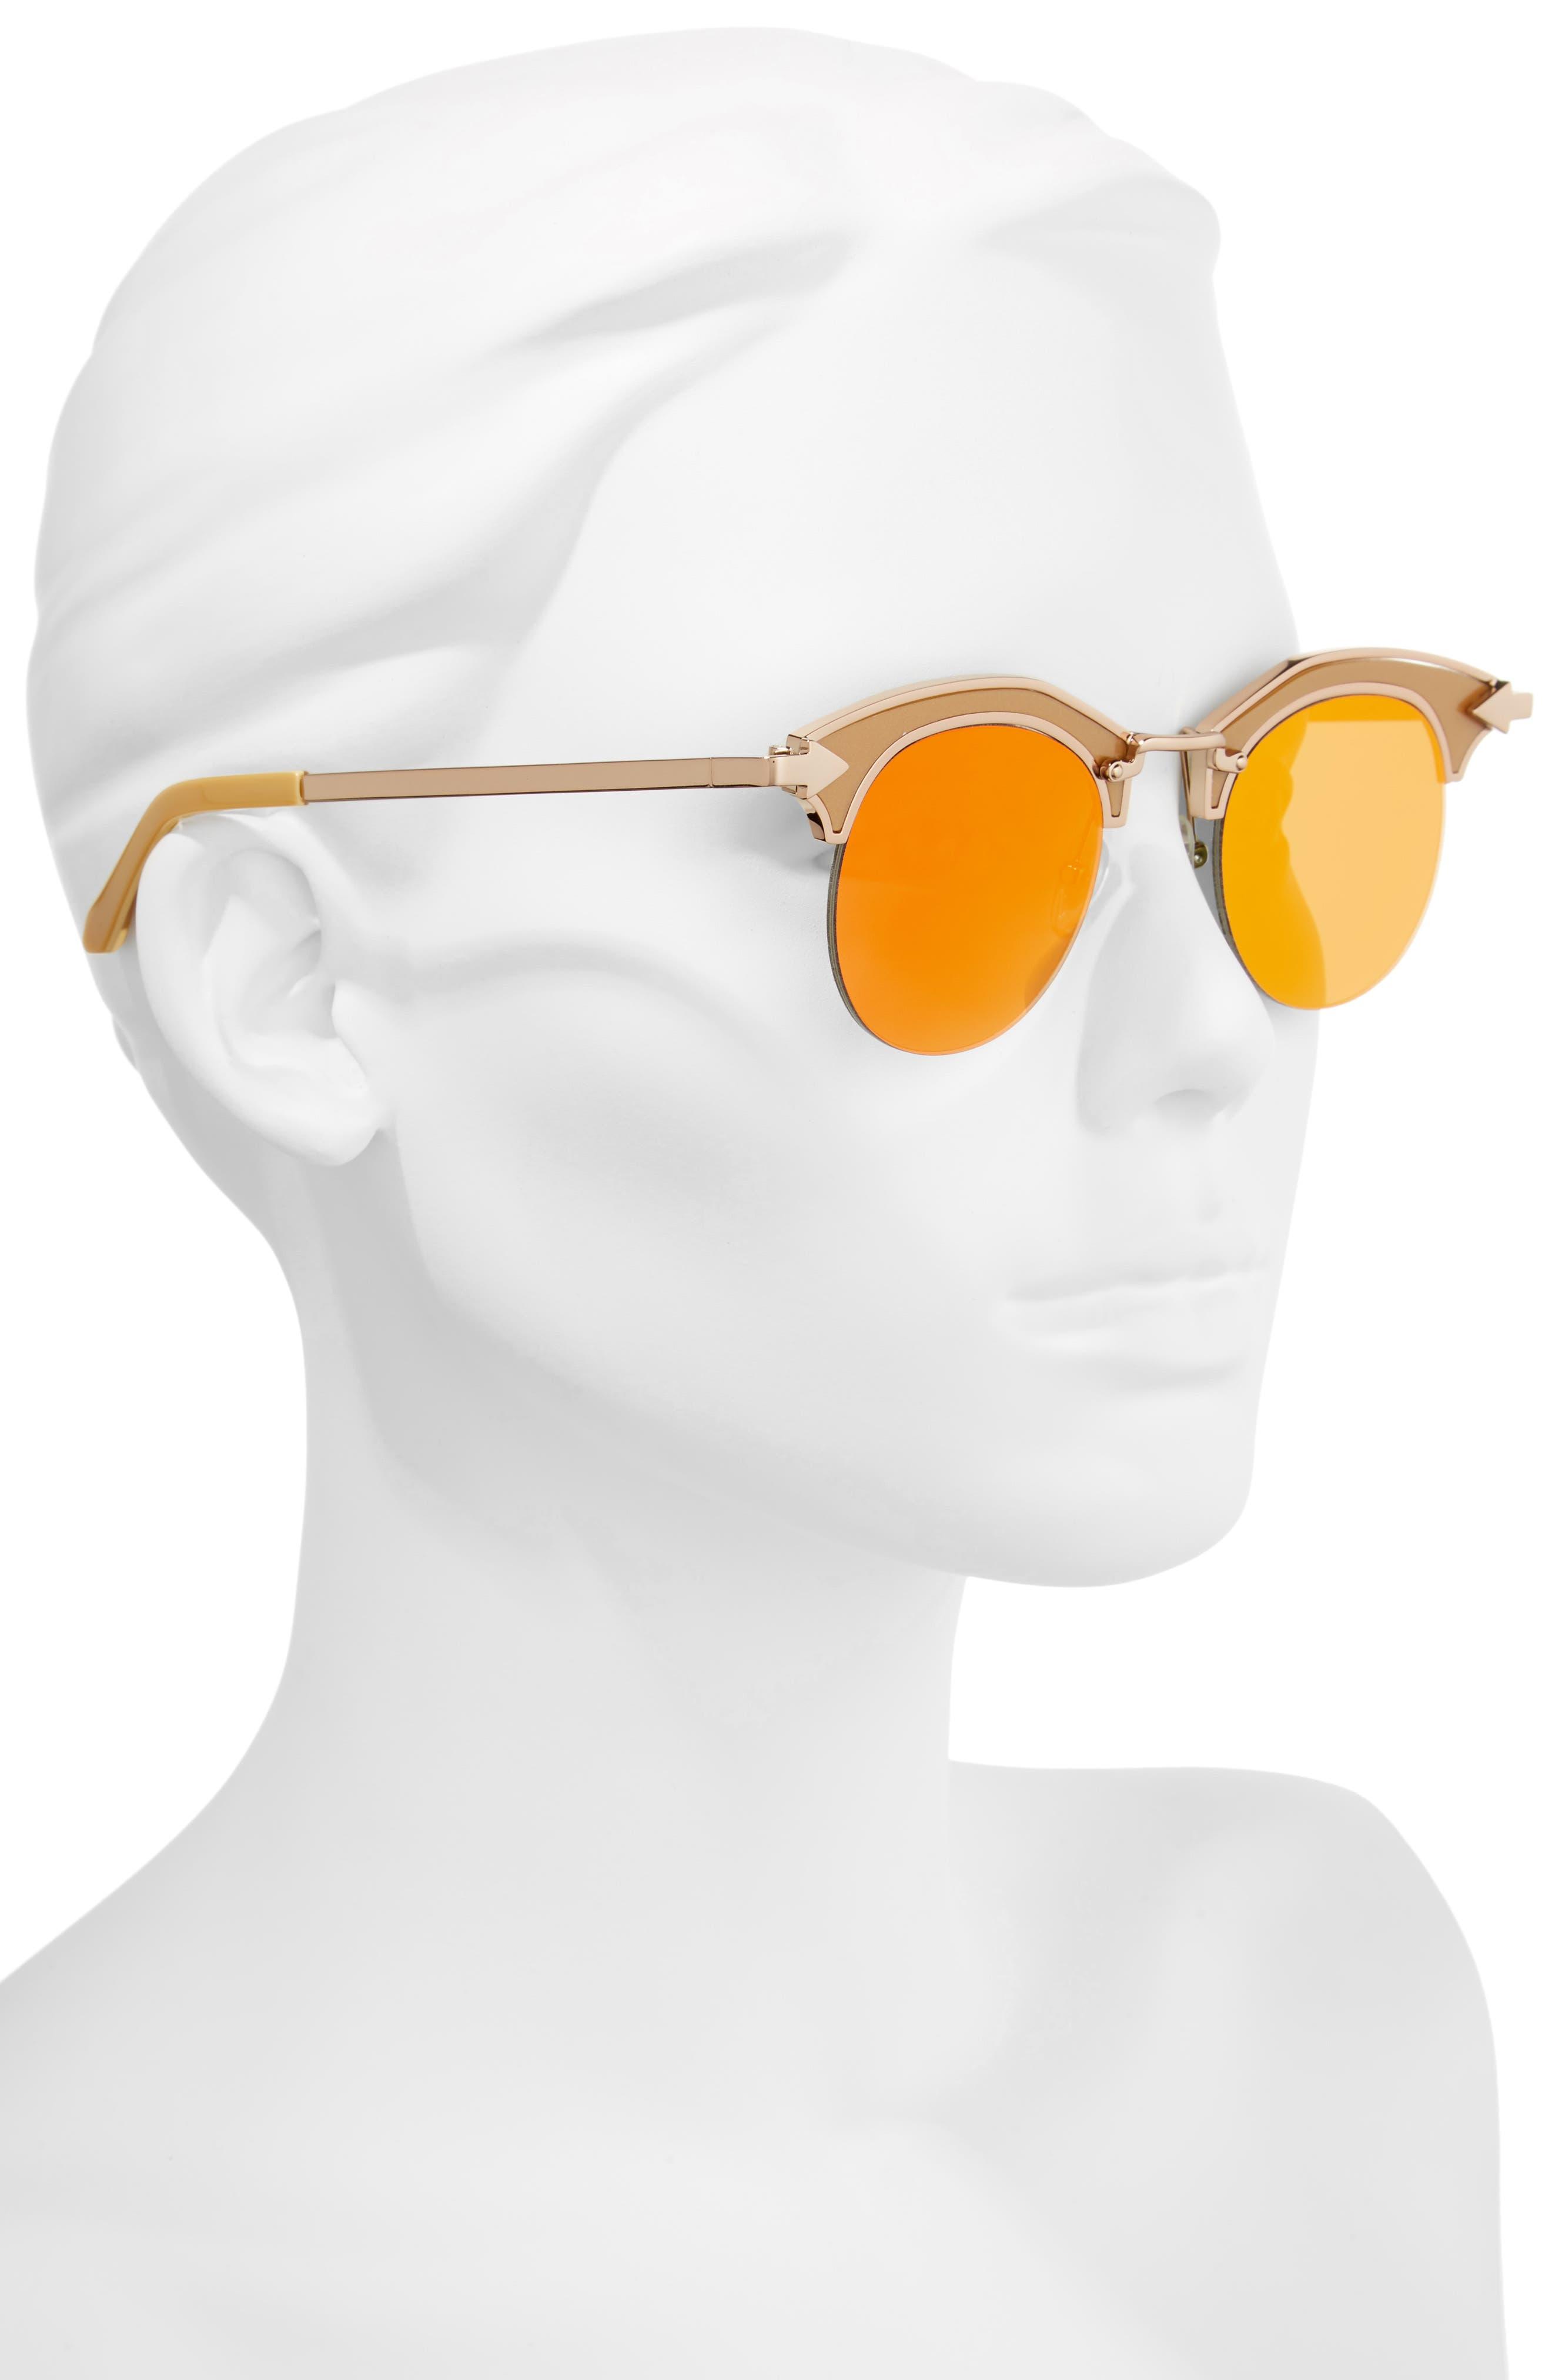 Buccaneer 47mm Round Sunglasses,                             Alternate thumbnail 6, color,